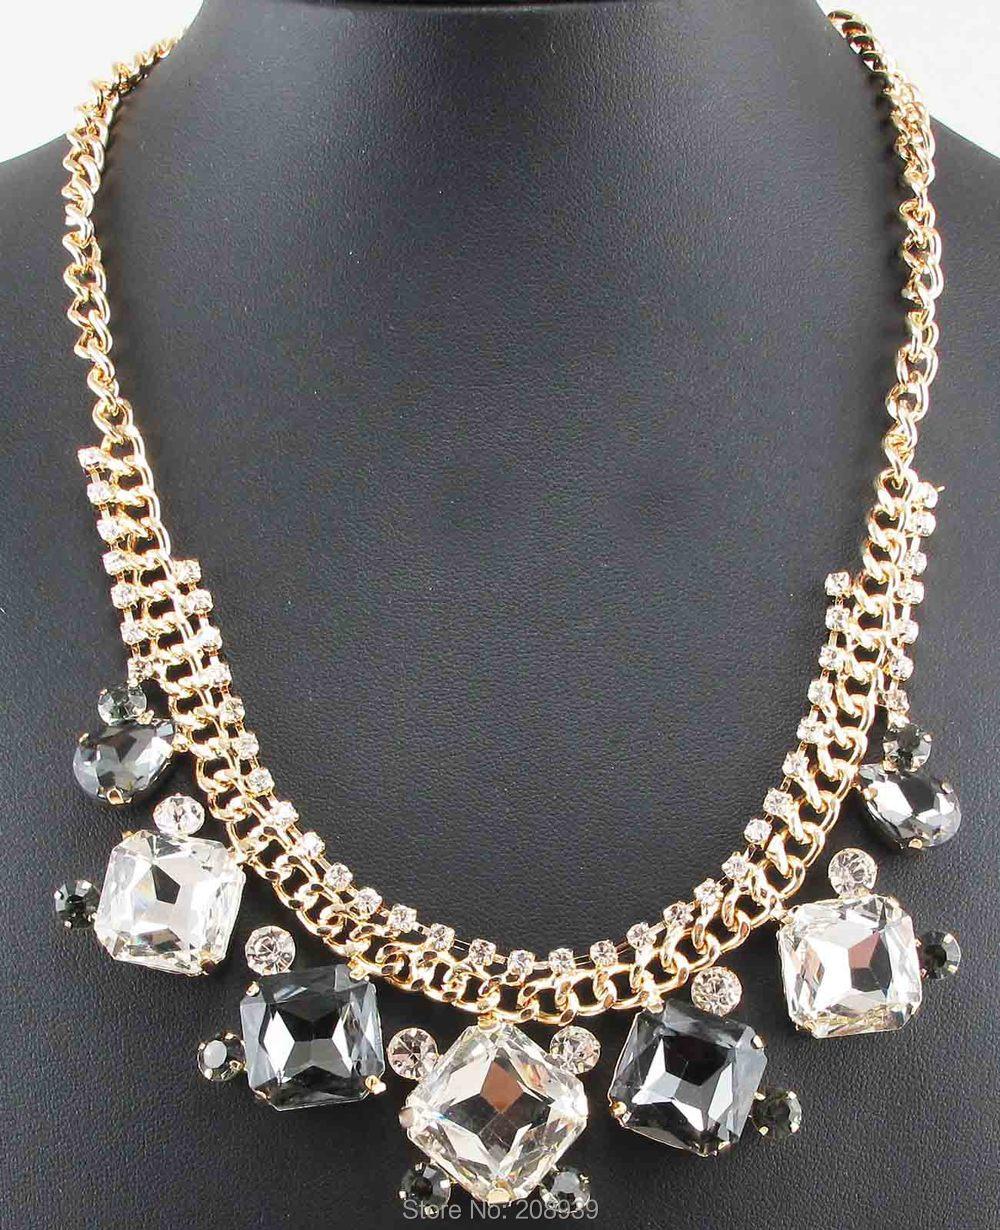 New Handmade Fashion Gray/White/Blue Glass Rhinestone Pendants Ancient Gold/Bronze Chain Bib Statement Women Choker Necklaces(China (Mainland))